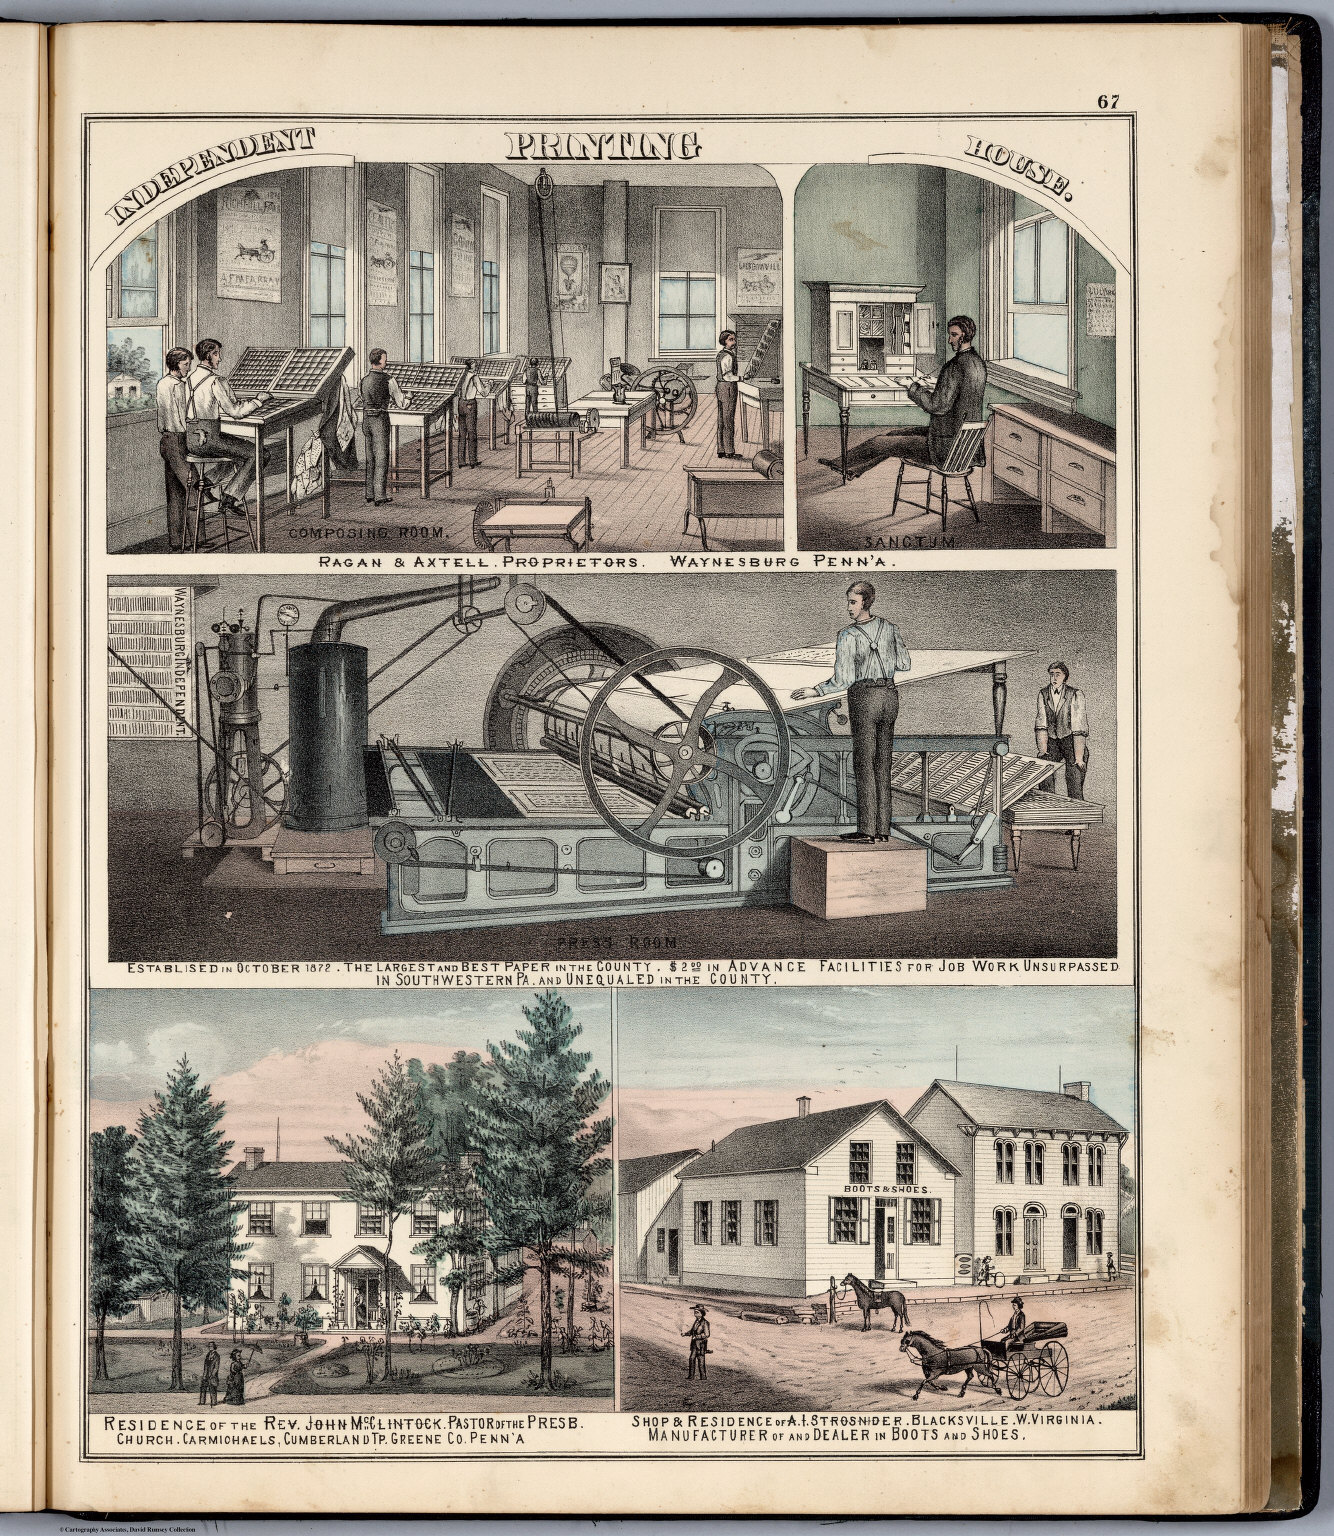 View: Ragan & Aztell. Residences of John McClintock, A.I. Strosnider, Greene County, Pennsylvania.